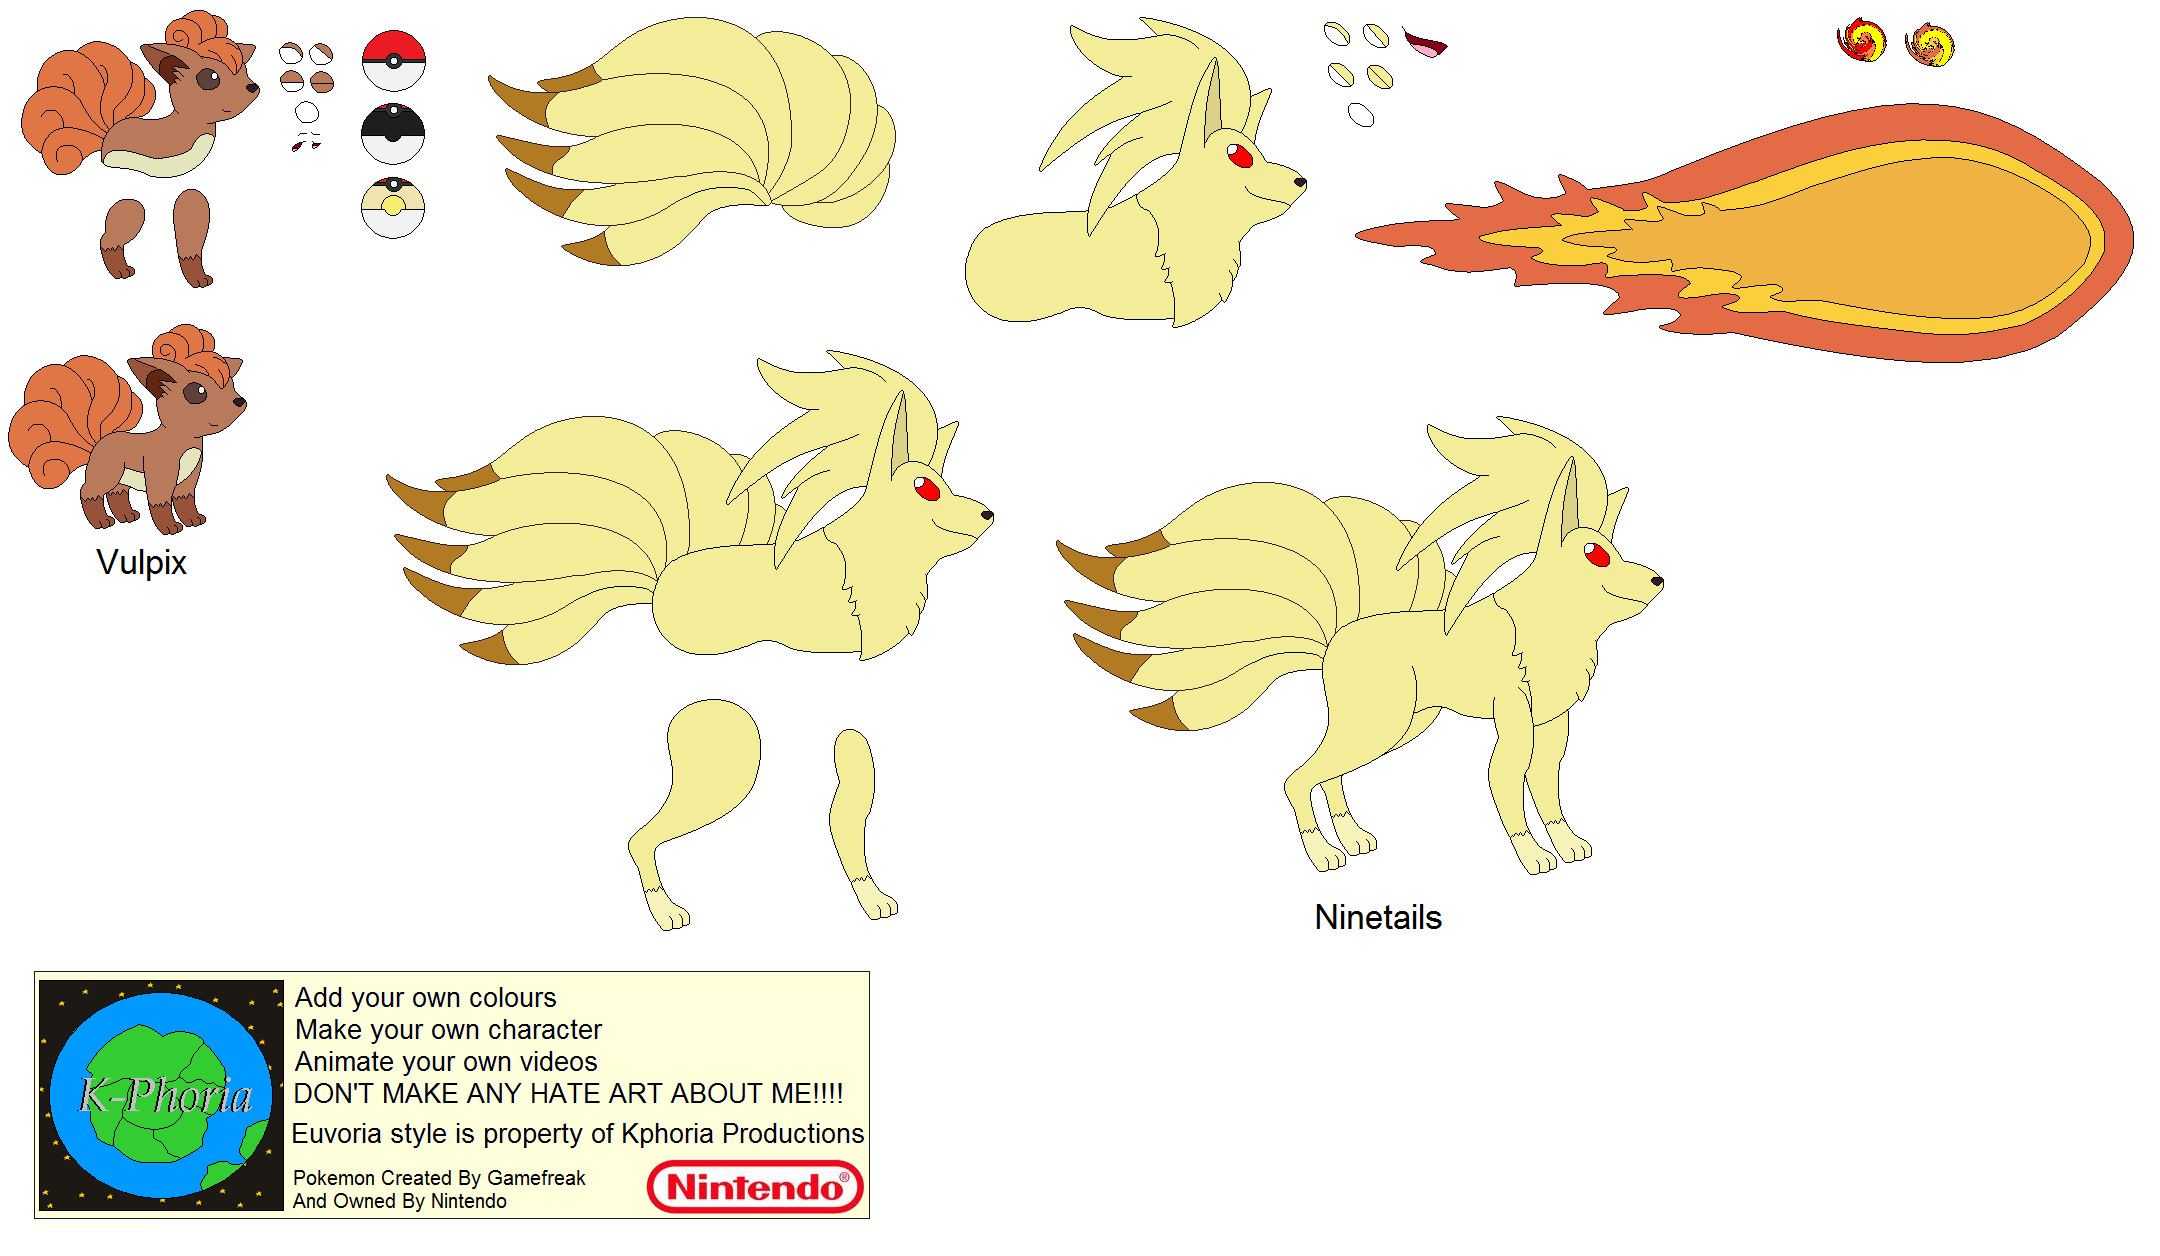 Vulpix Pokemon Evolution